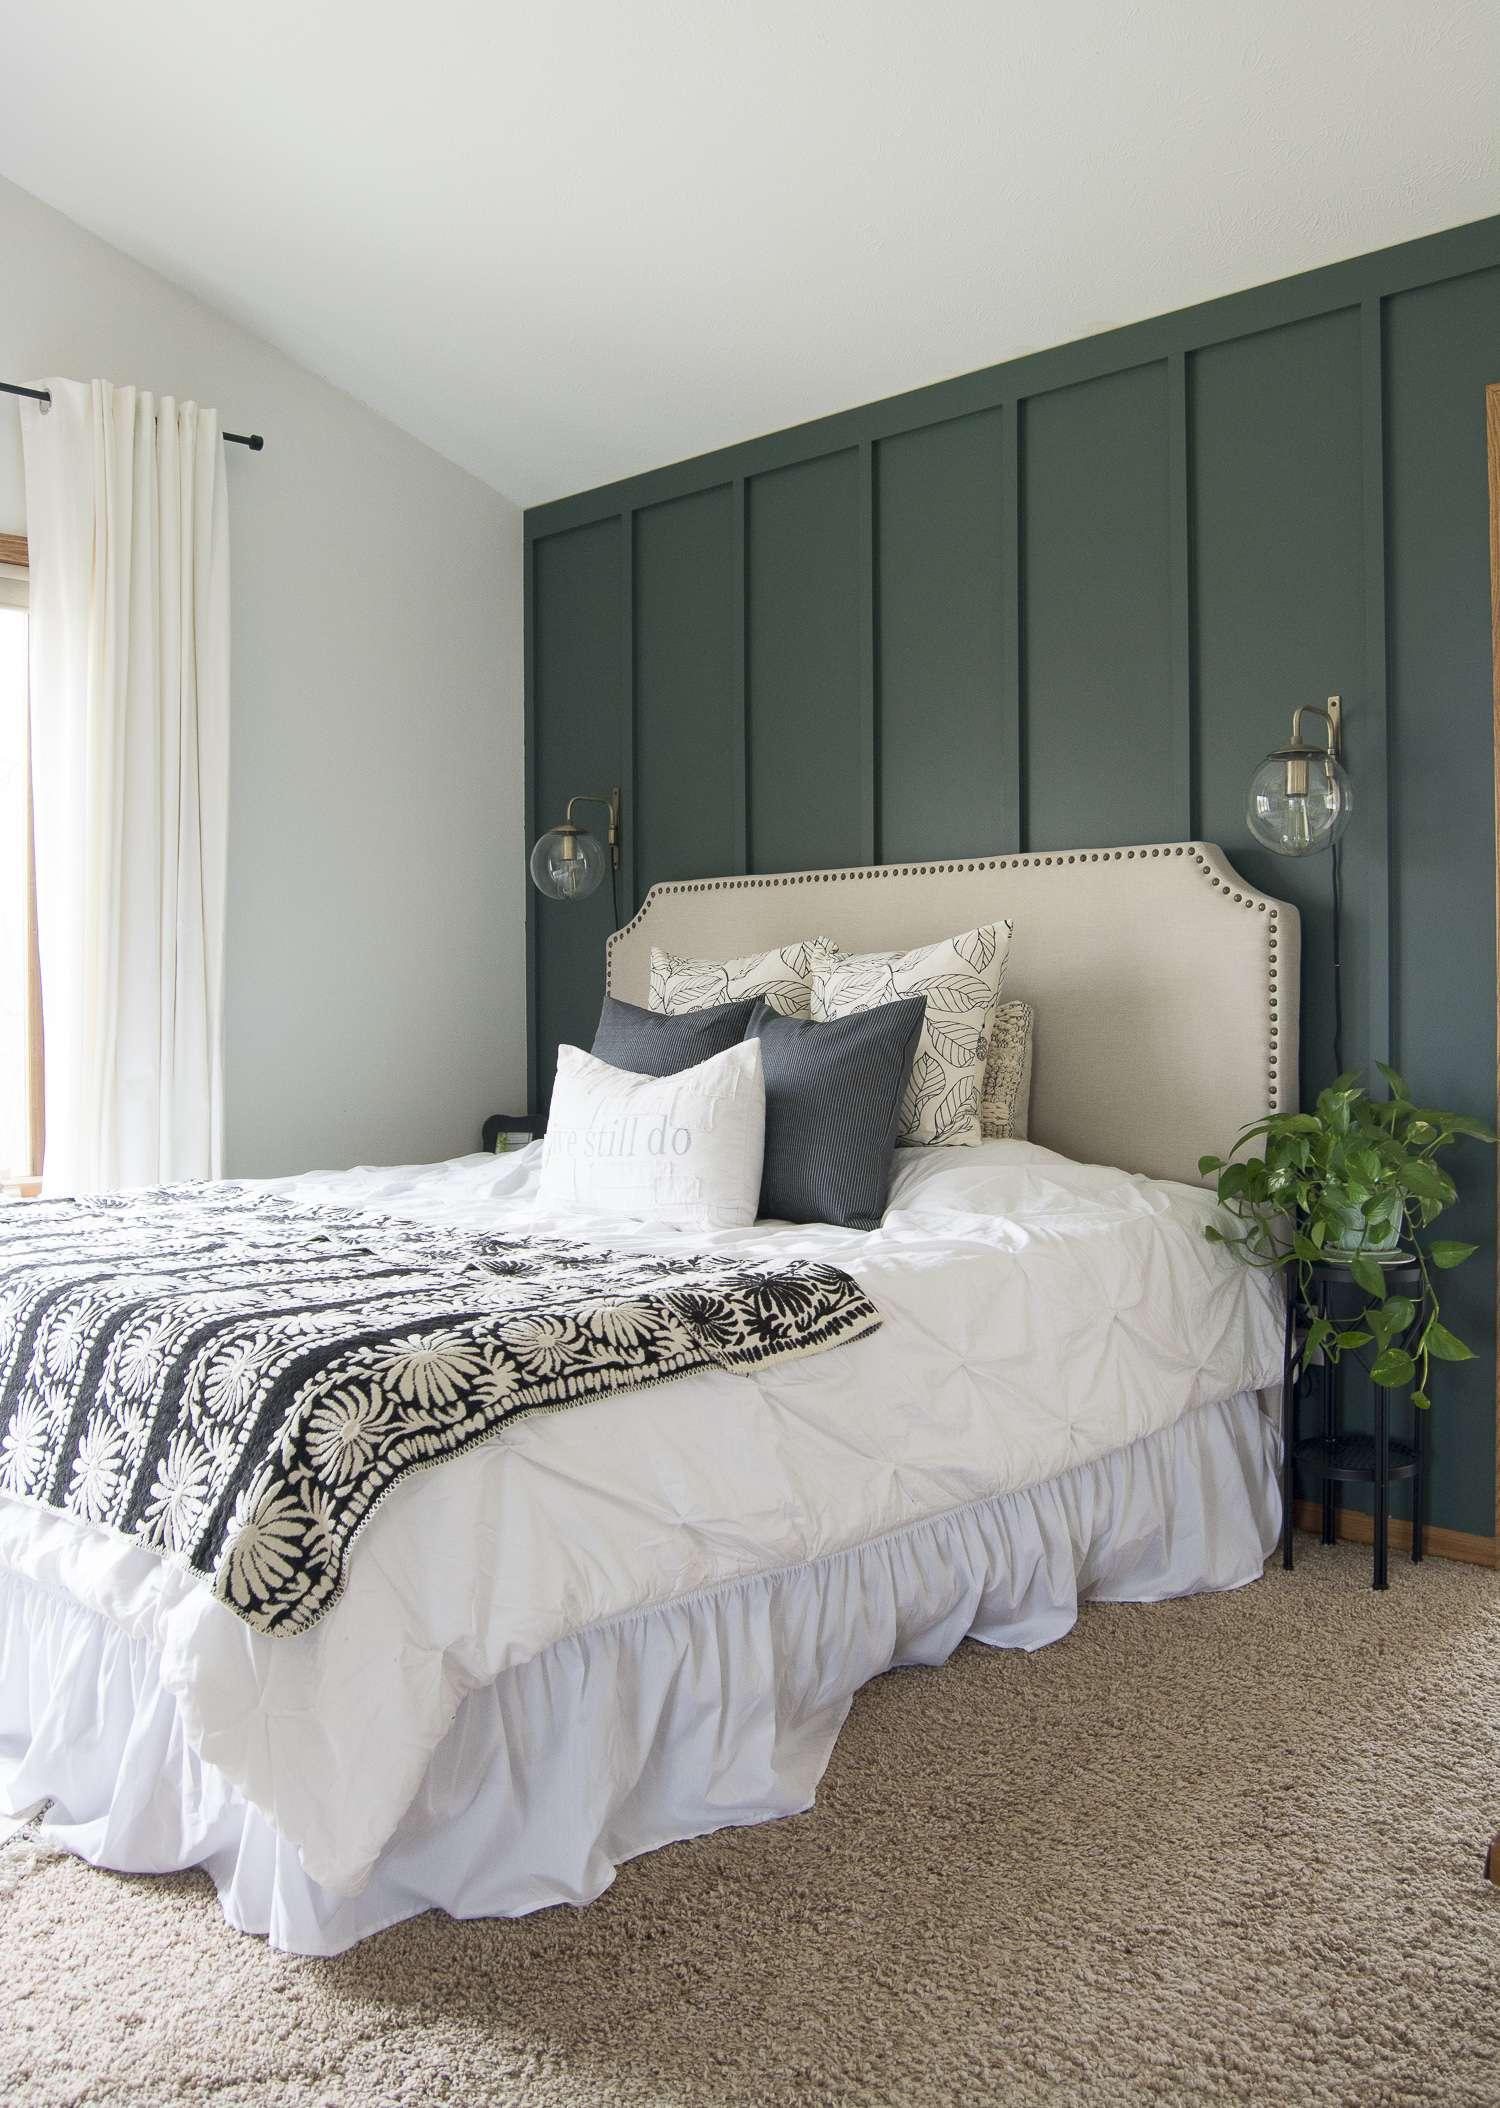 Modern Farmhouse Bedroom Decor: Finishing Touches   Grace ... on Bedroom Farmhouse Decor  id=91714